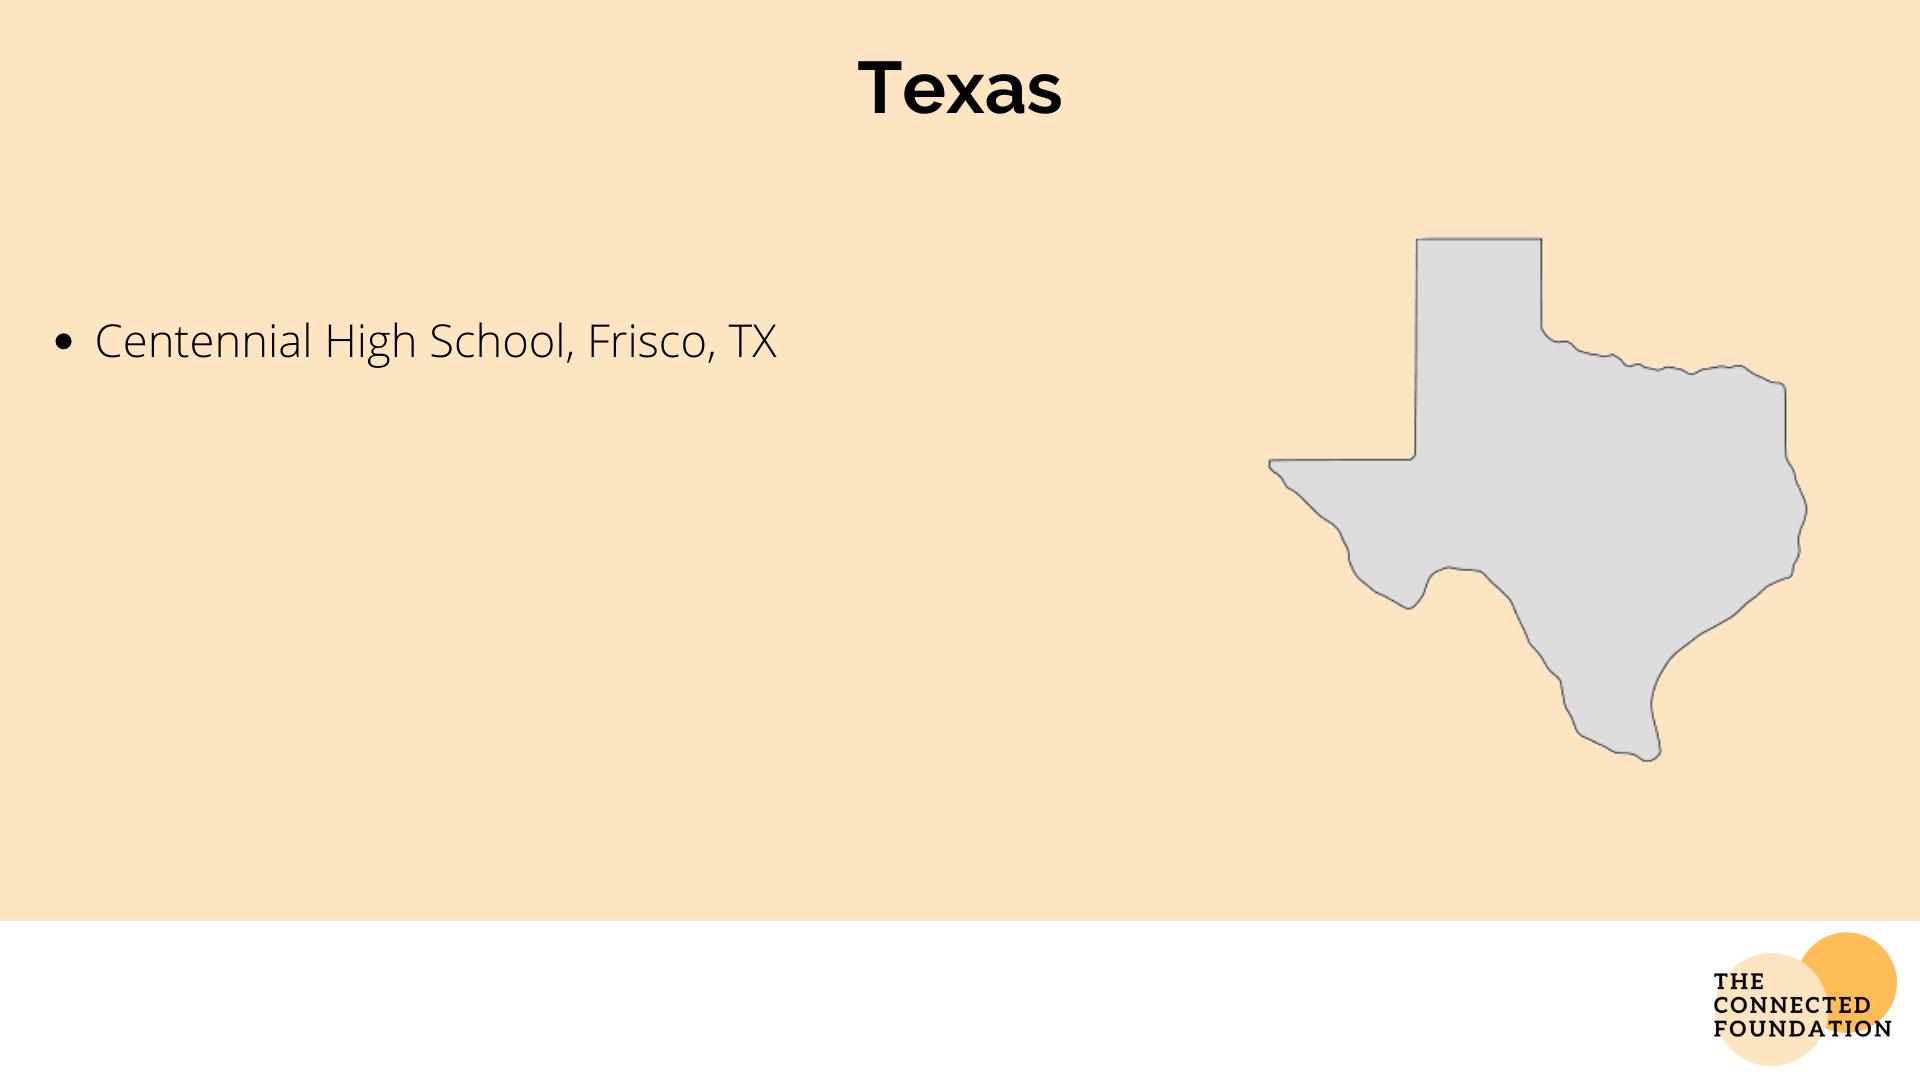 Centennial High School in Texas